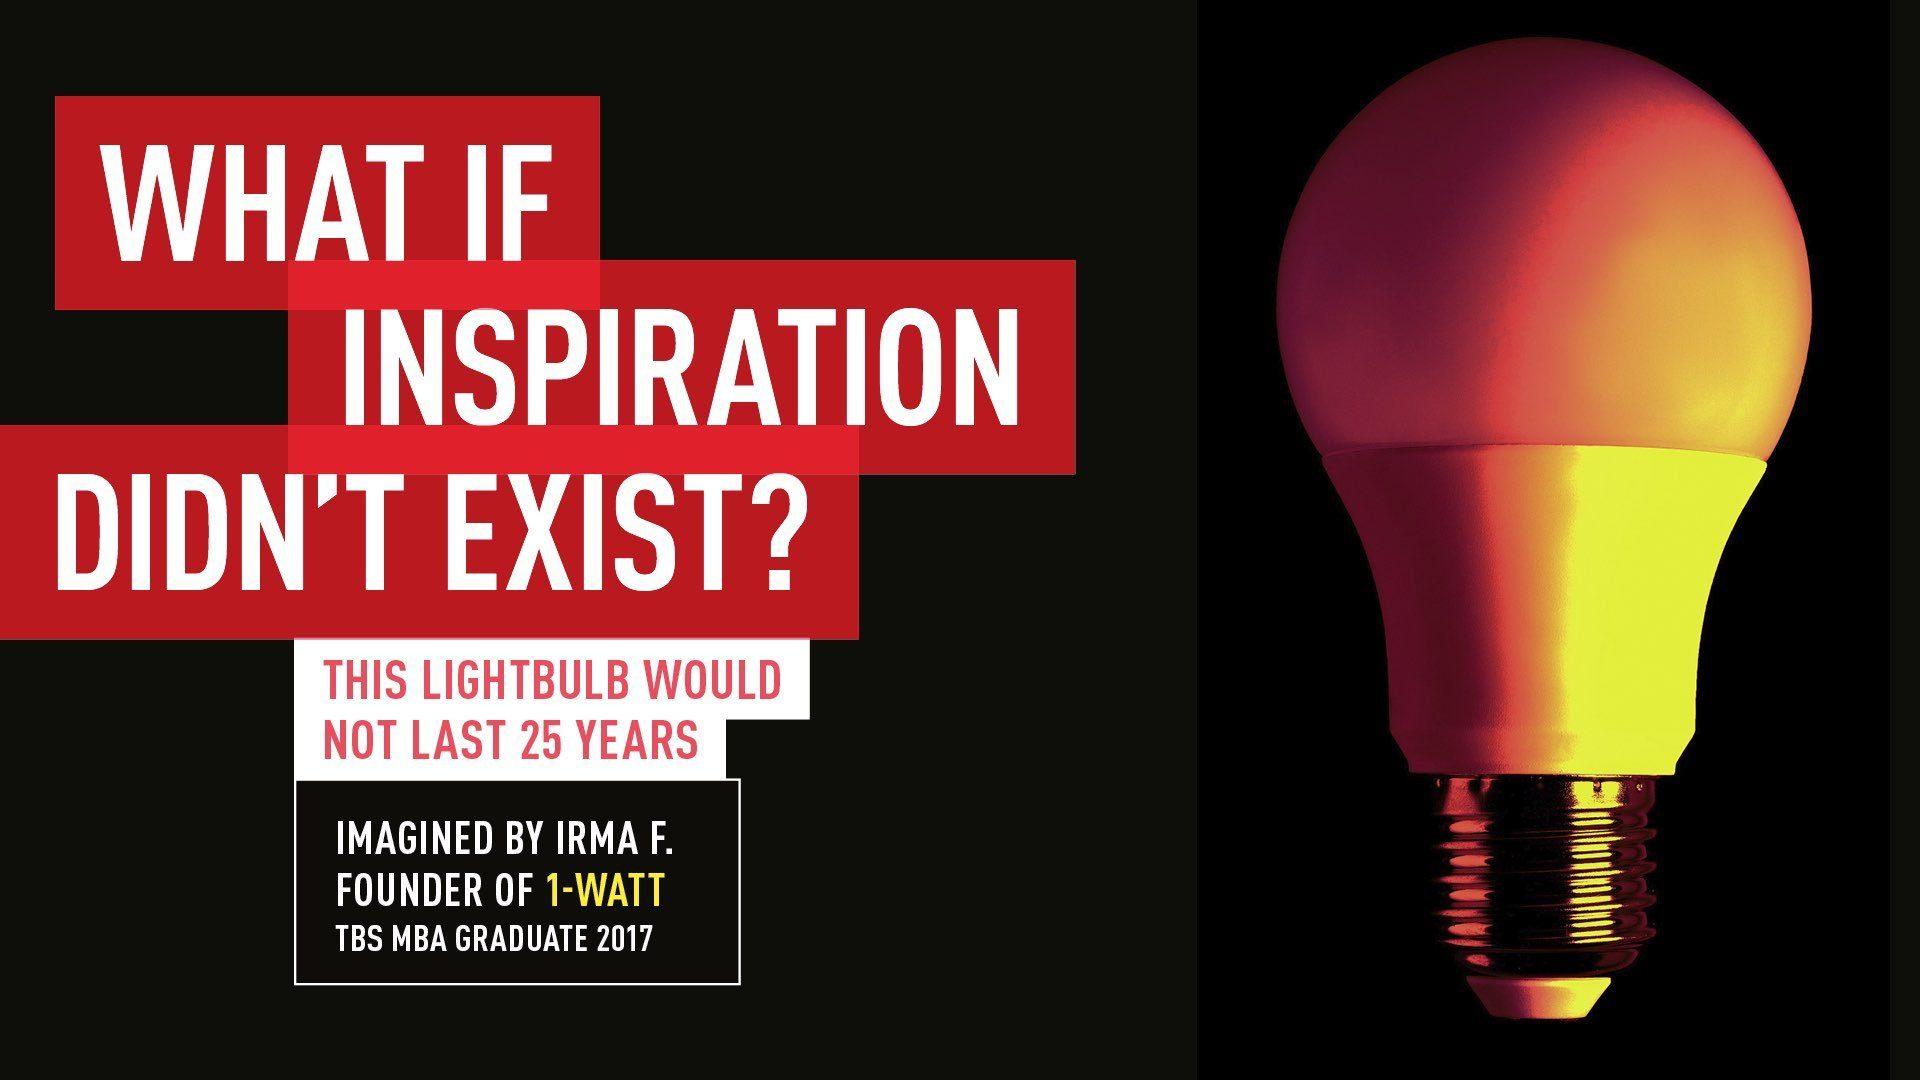 Lightbulb Campaign 1920 X 1080 Gb Light